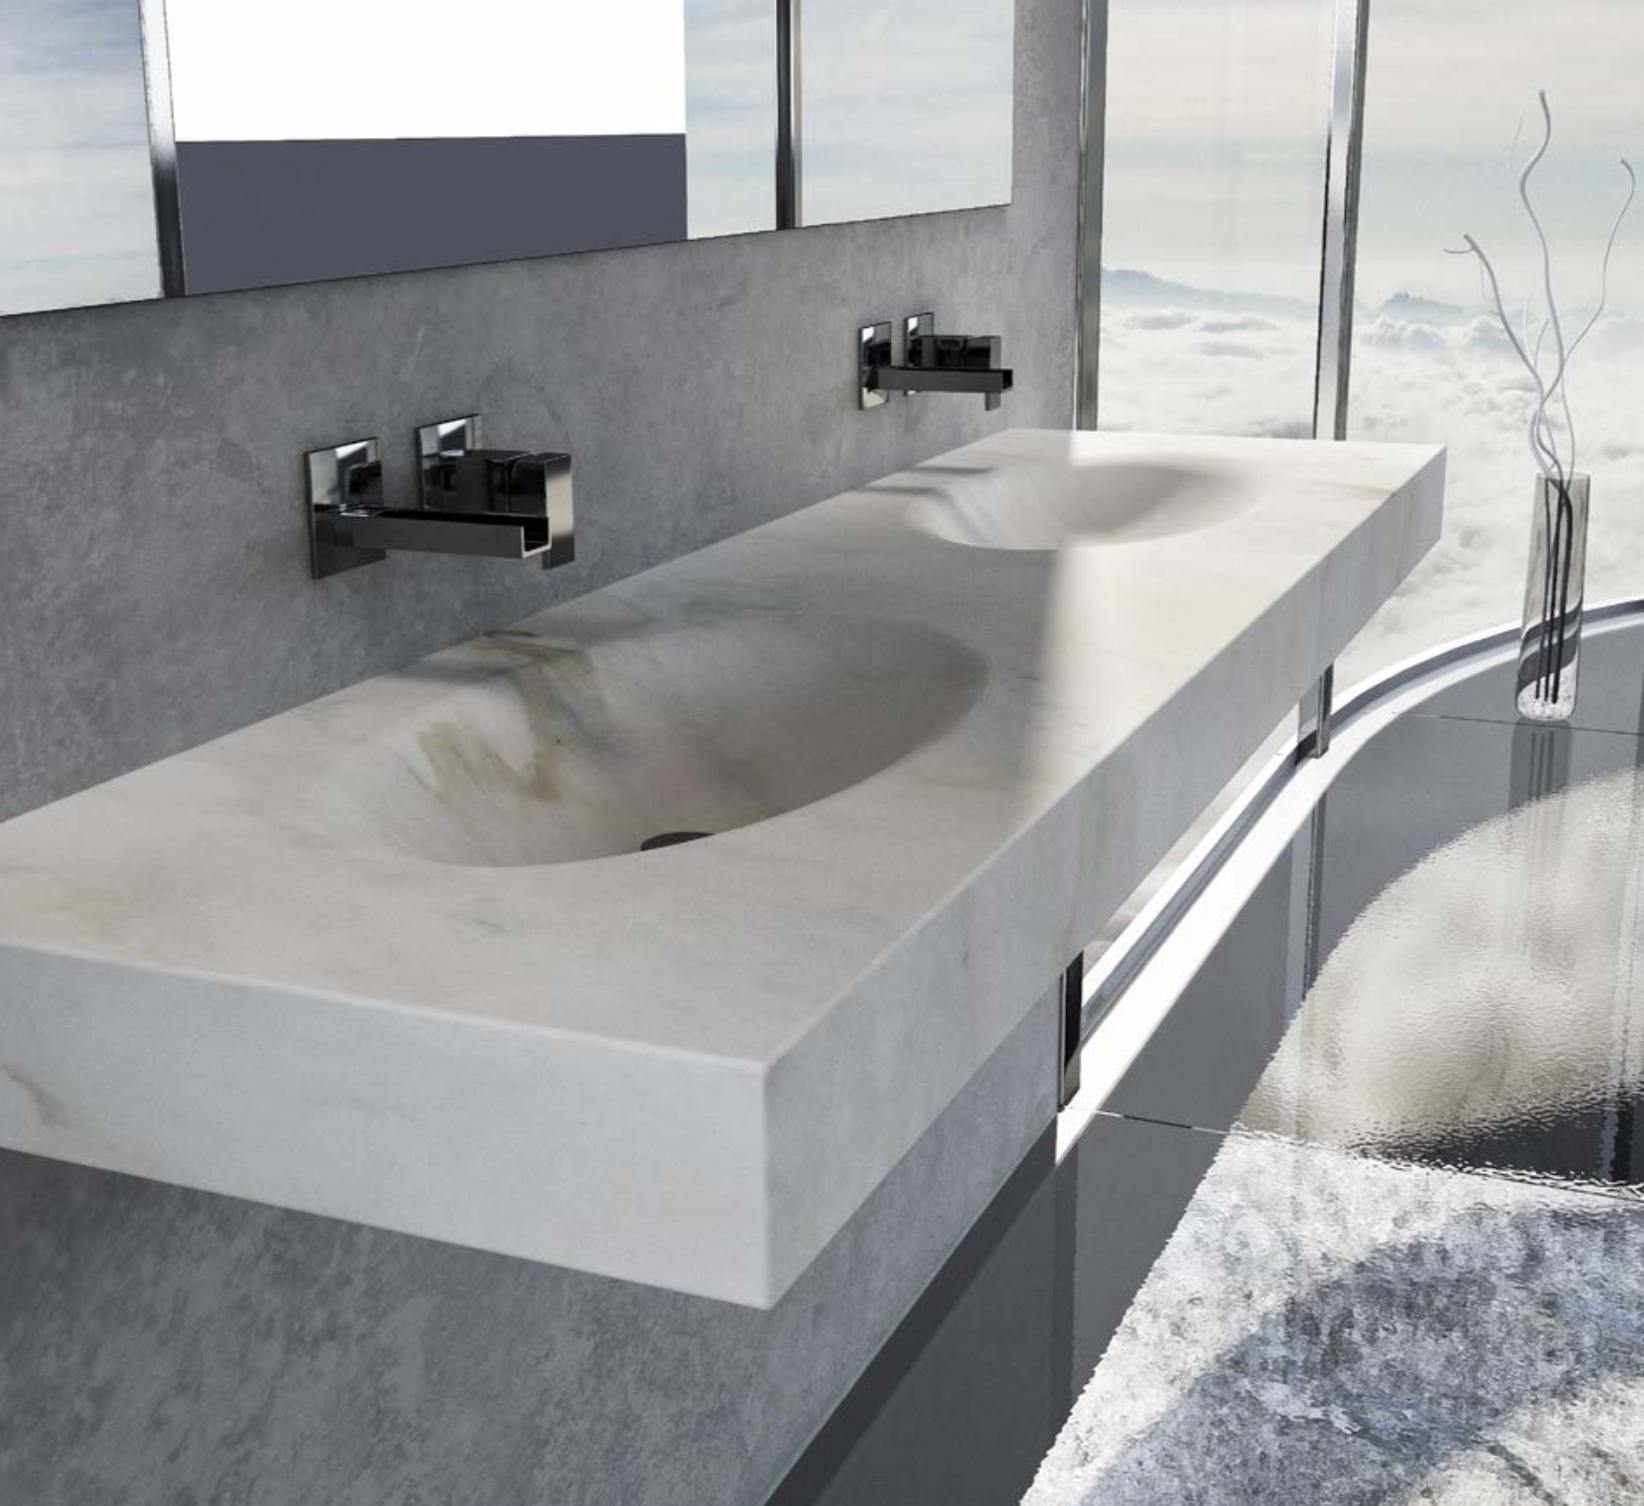 Tech in Interiors - Dedalo Stone - Marble washbasin console - Masha Shapiro Agency UK.png